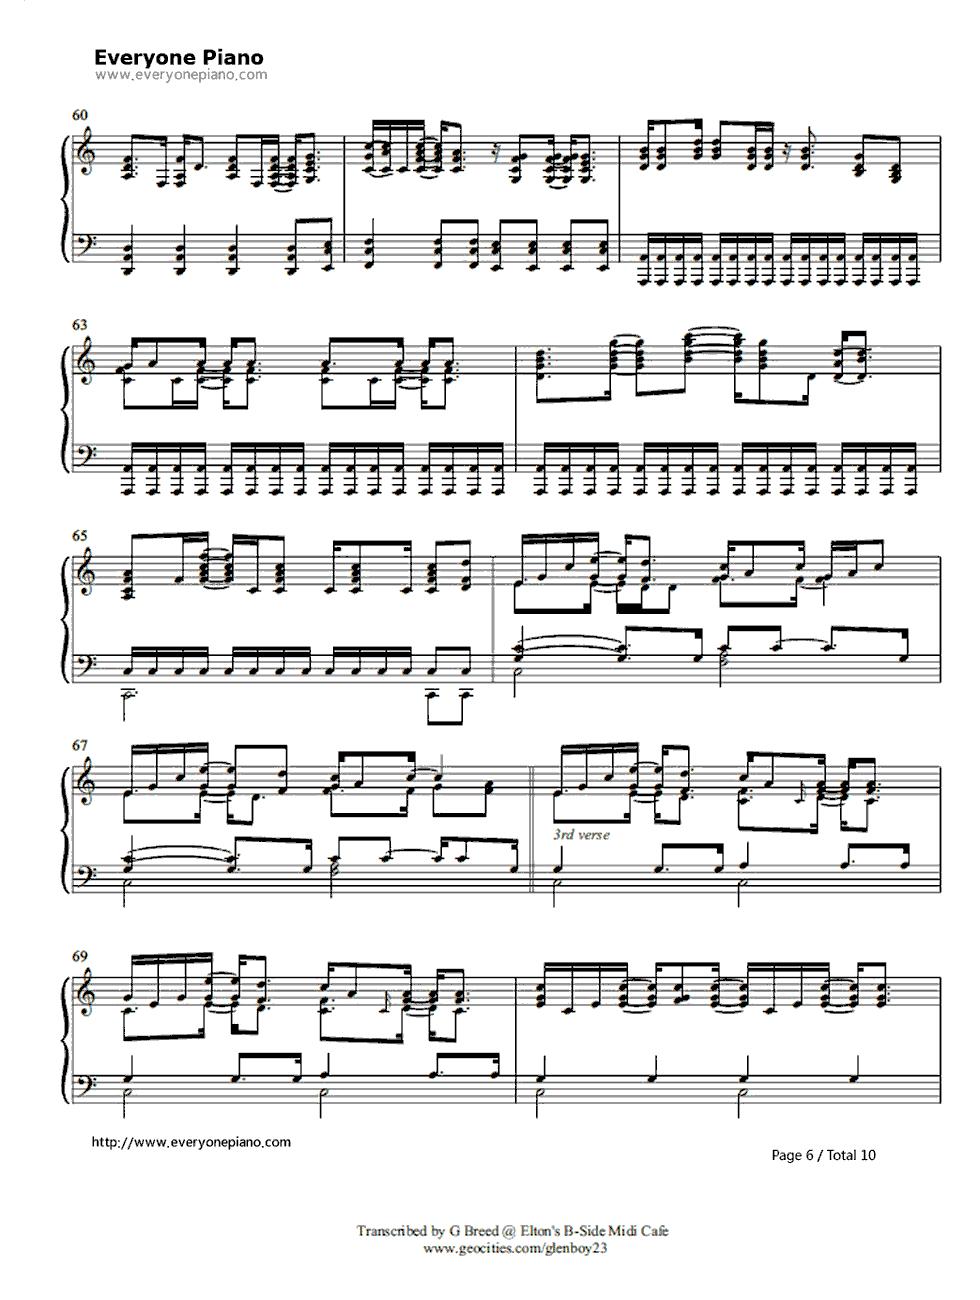 Tiny dancer elton john stave preview 6 free piano sheet music listen now print sheet tiny dancer elton john stave preview 6 hexwebz Images